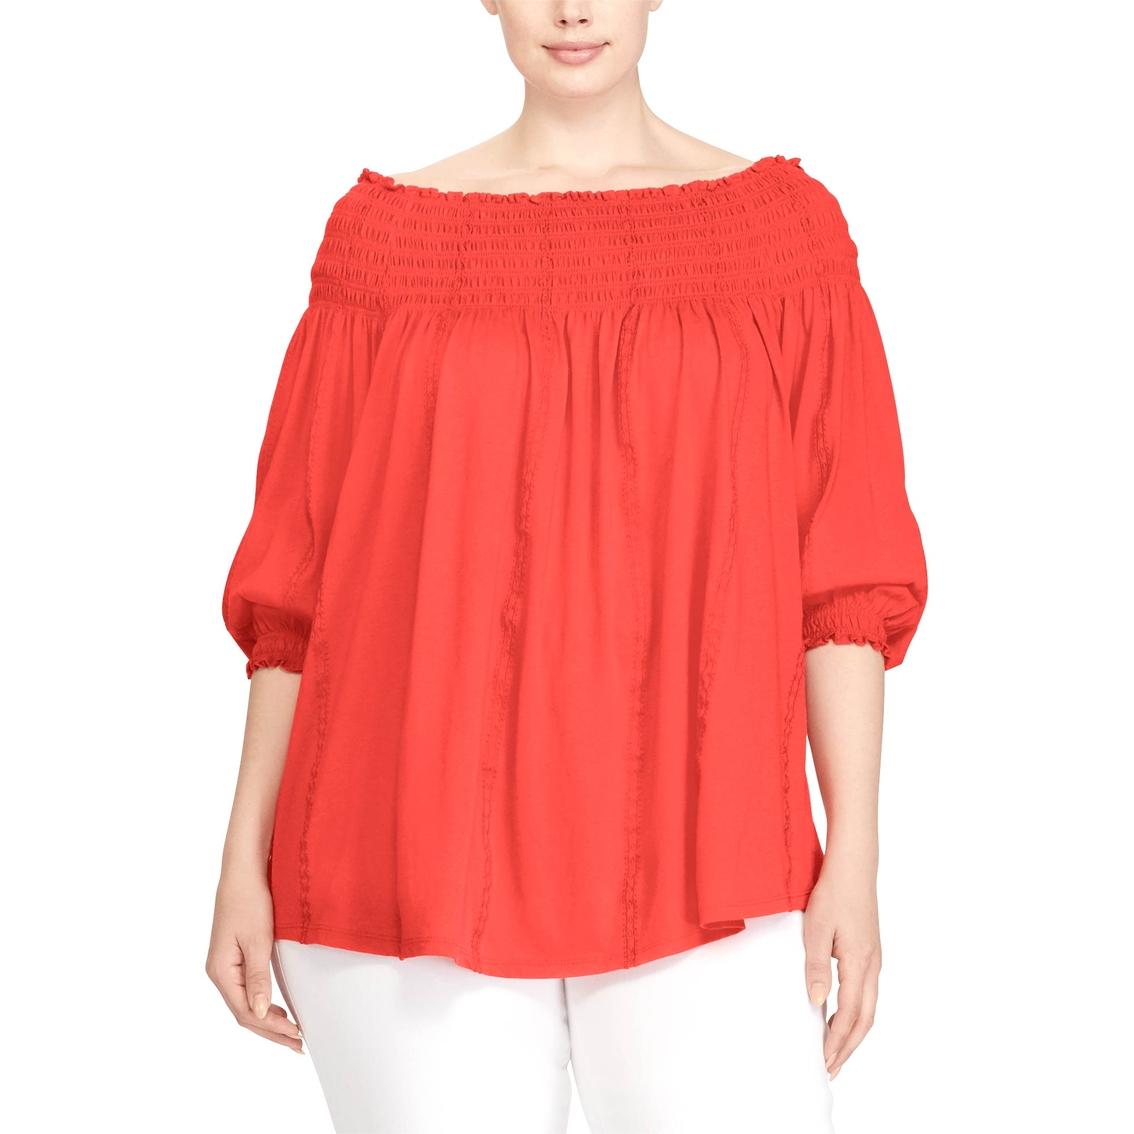 40e6c732c86d10 Lauren Ralph Lauren Plus Size Quarida Smocked Off-the-shoulder Top ...